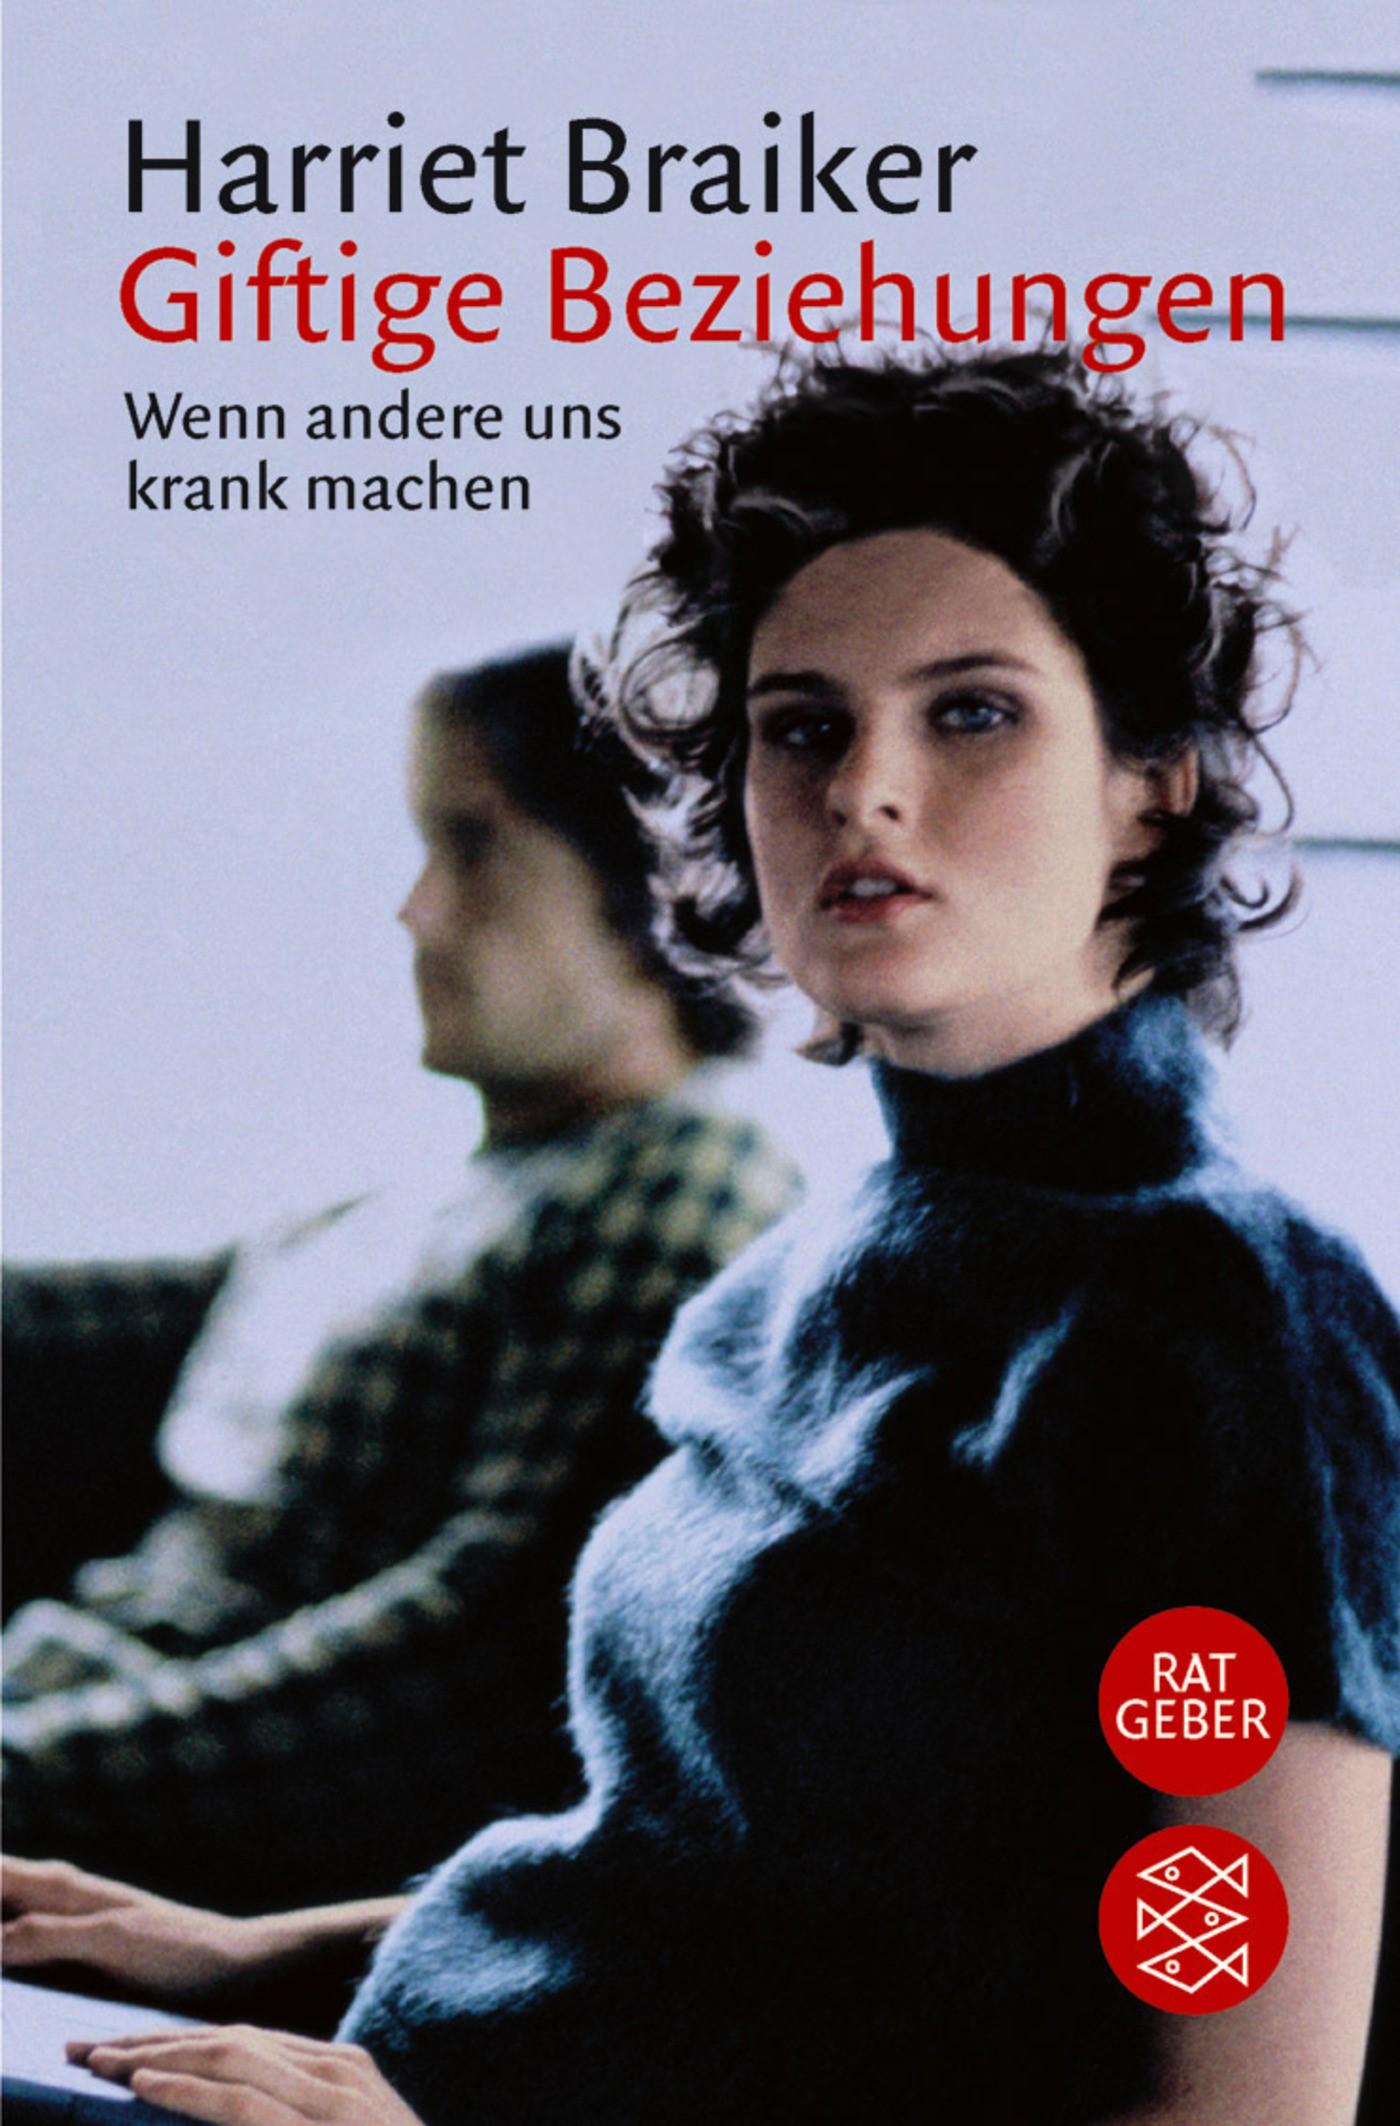 Giftige Beziehungen | Braiker, 2001 | Buch (Cover)